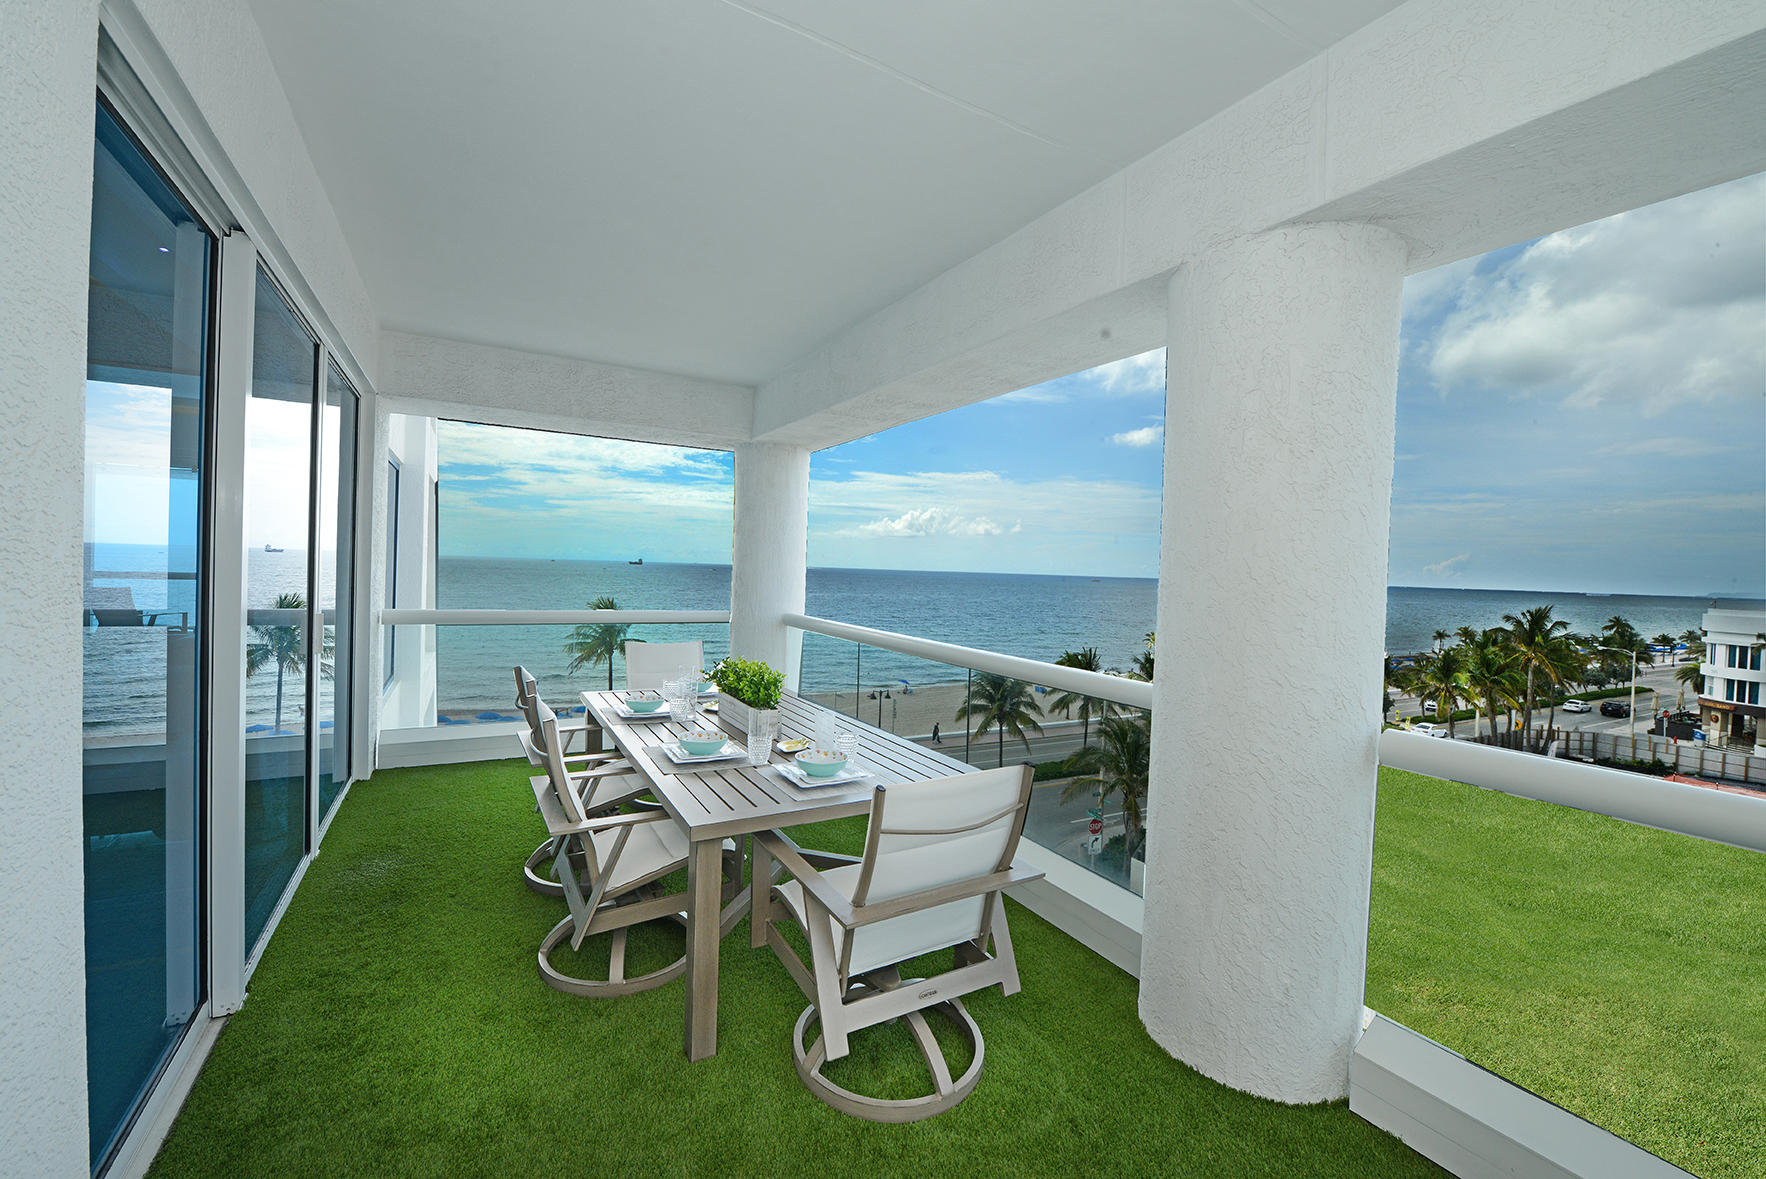 Photo of 551 N Fort Lauderdale Beac #R407, Fort Lauderdale, FL 33304